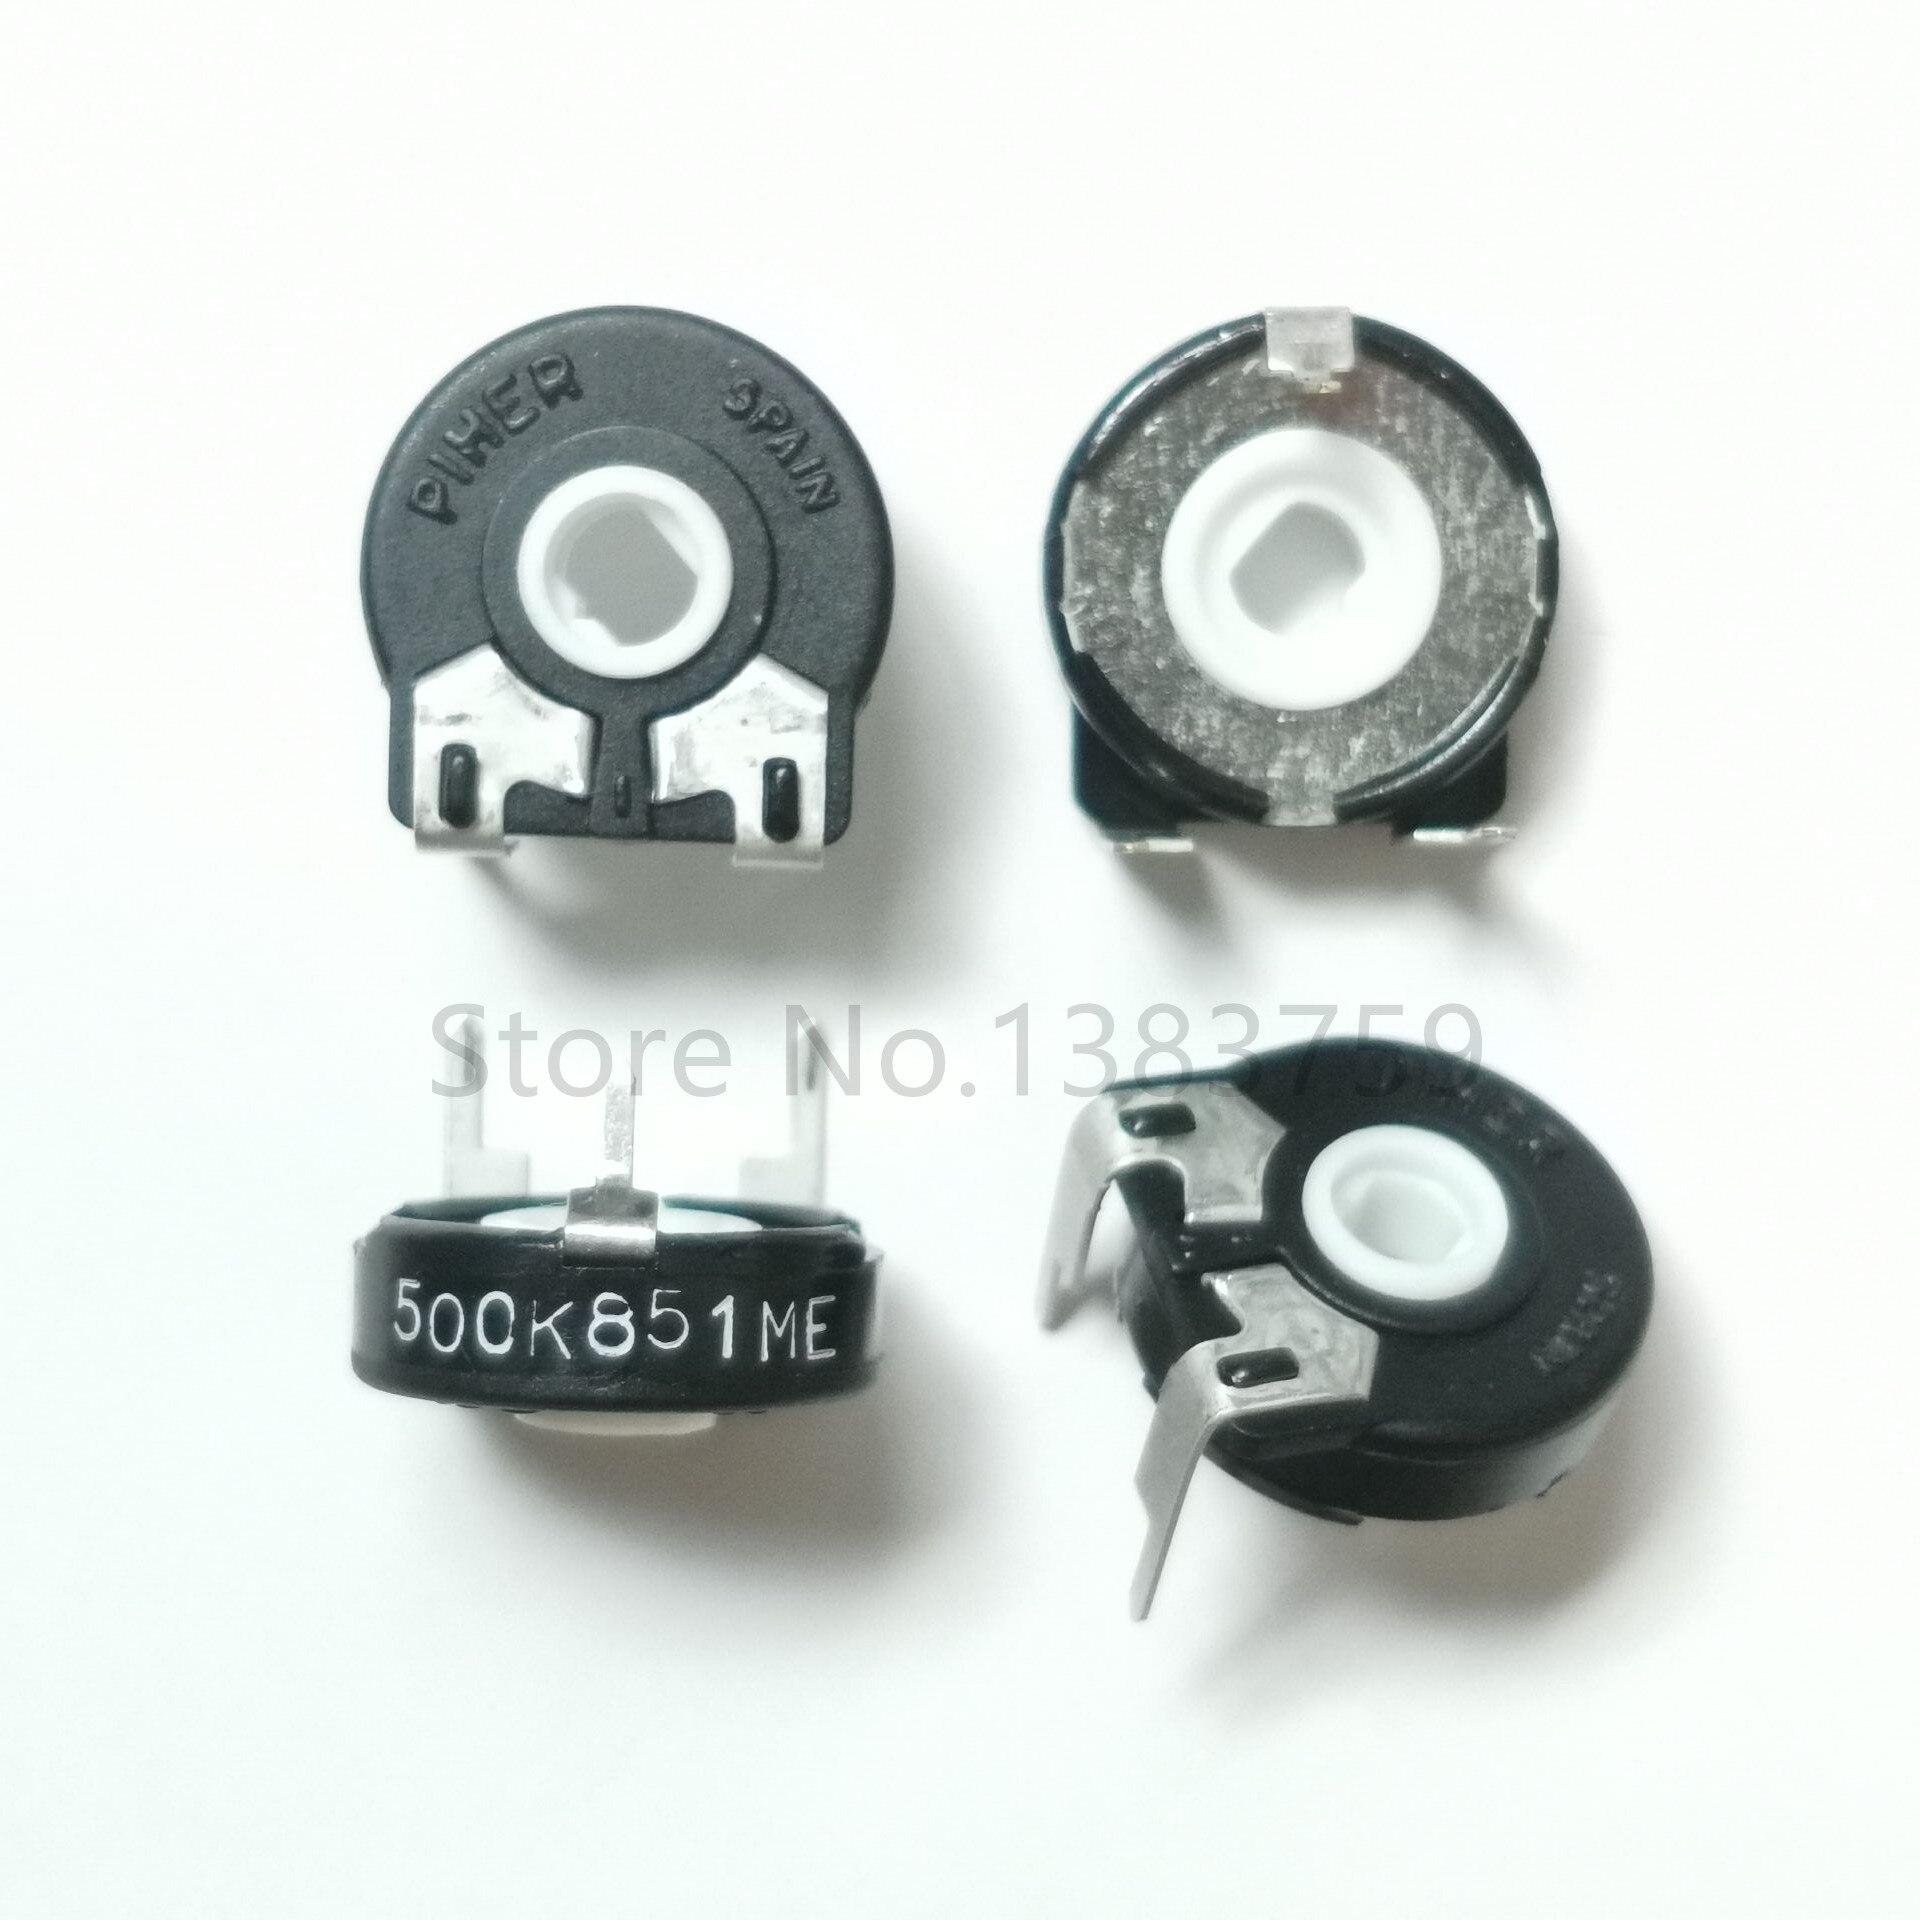 5pcs Variable Resistor PT15-500K 504 Horizontal Elliptical Hole Adjustable Potentiometer